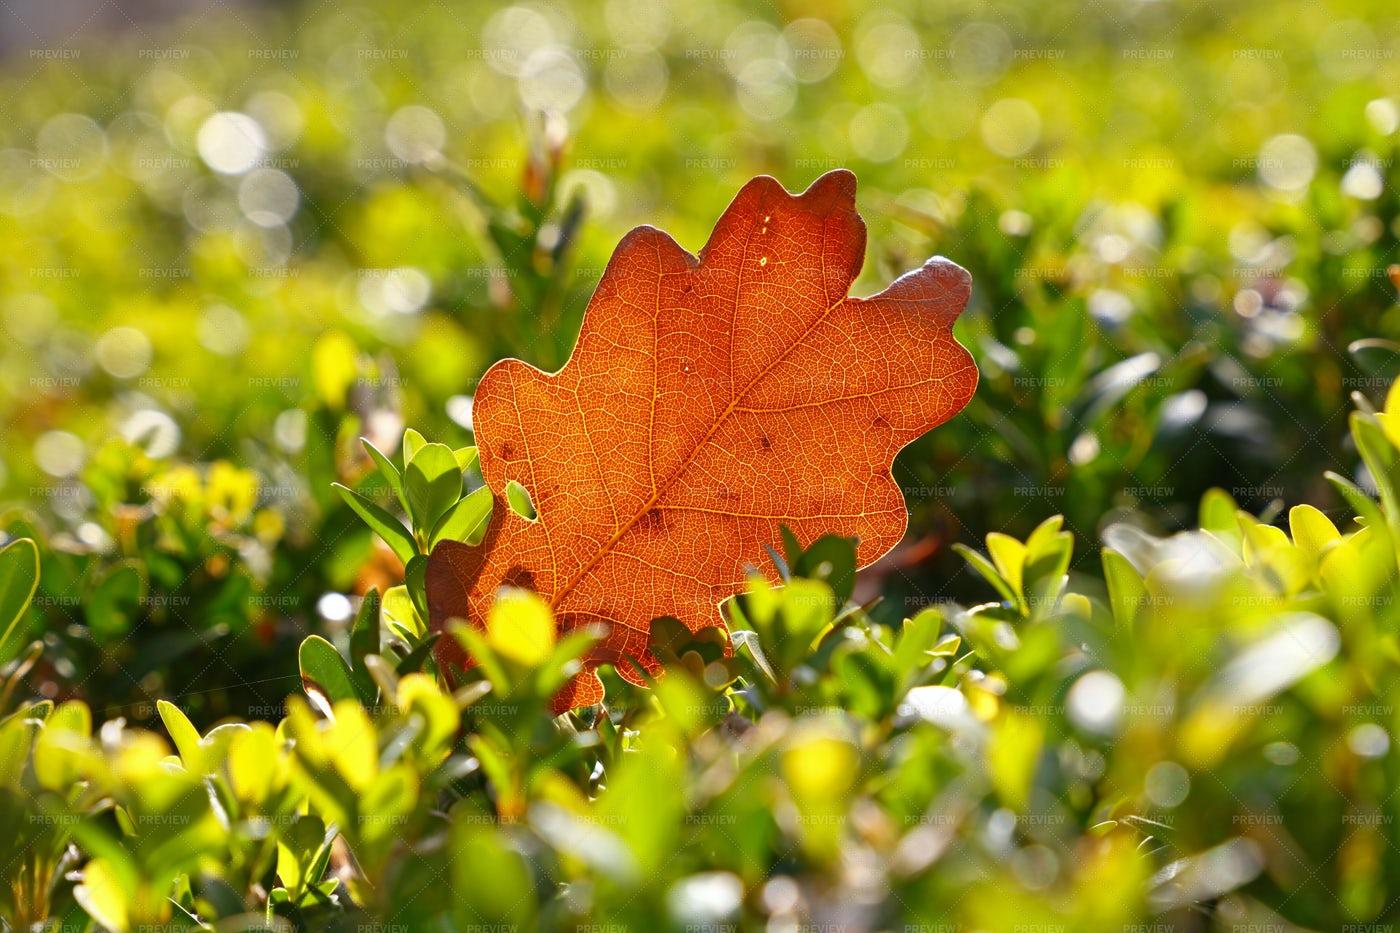 Oak Leaf On Grass: Stock Photos